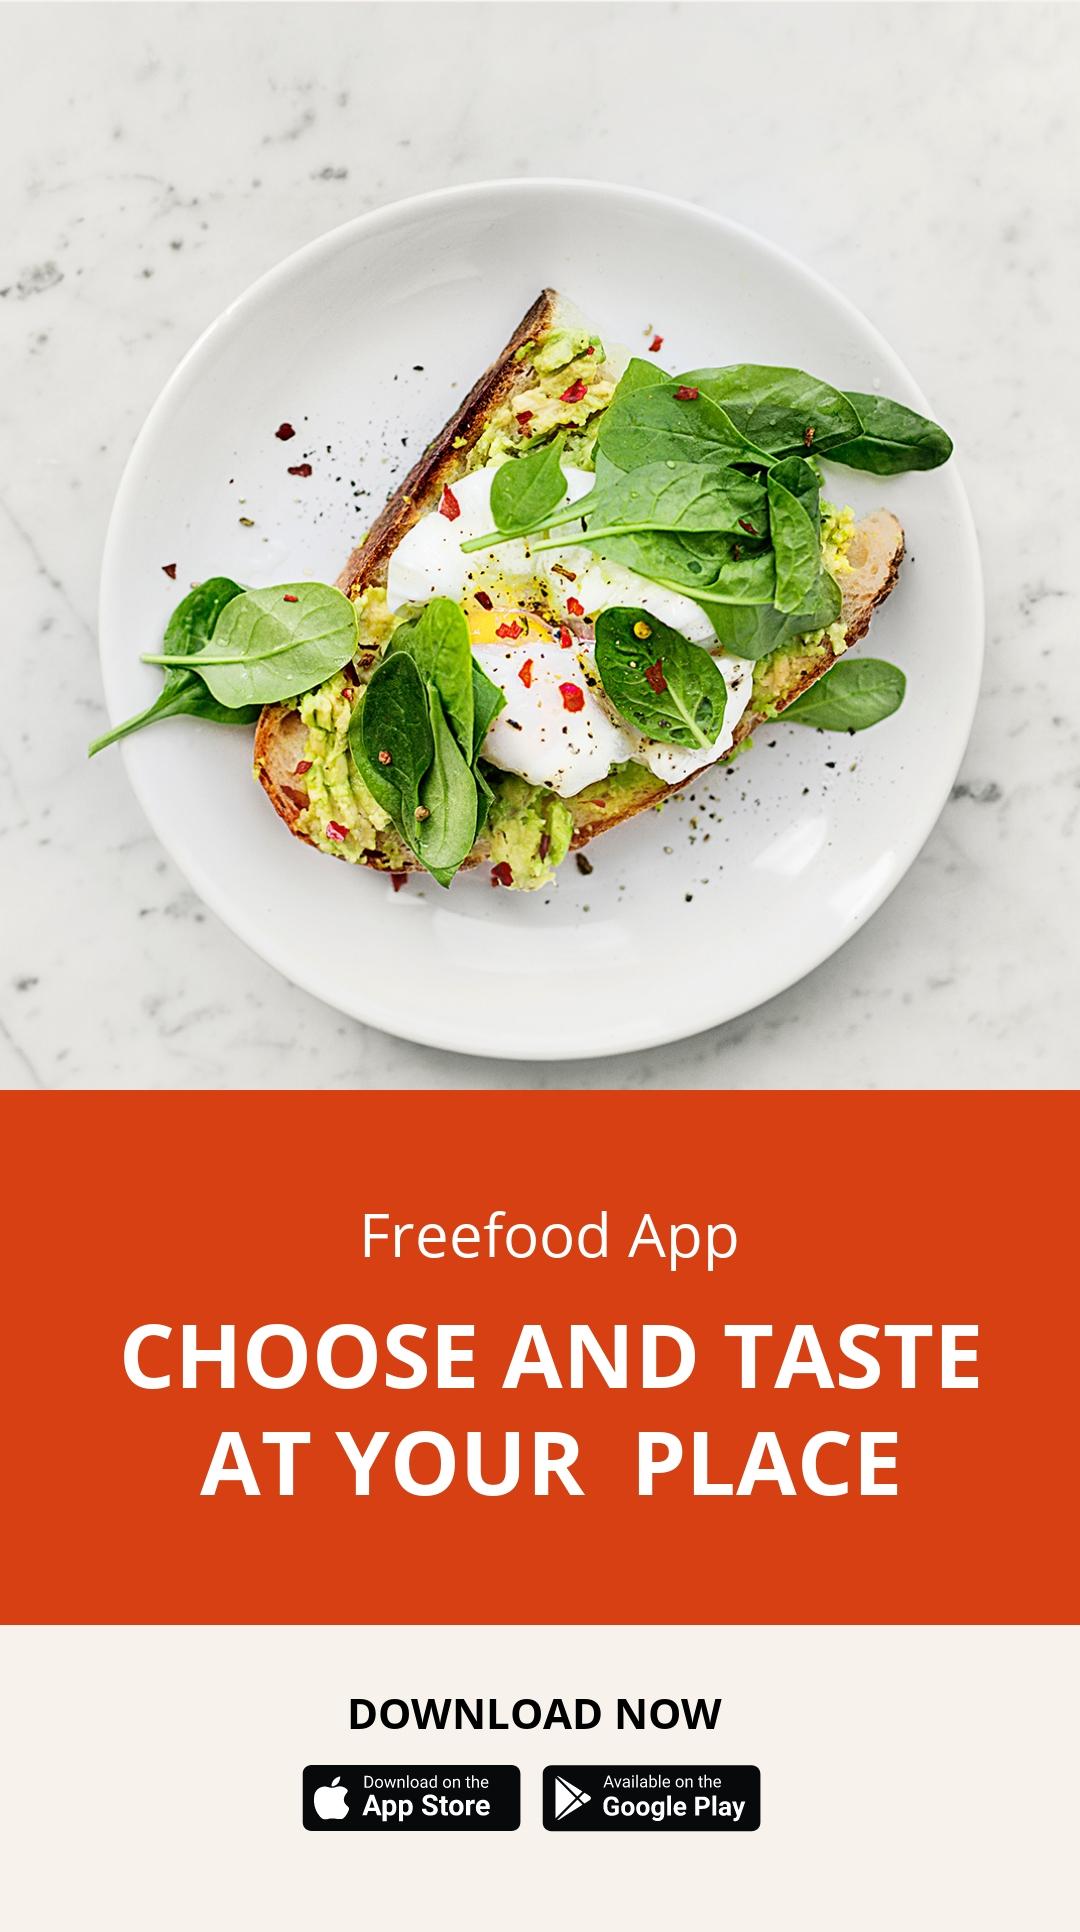 Food Mobile App Promotion Instagram Story Template